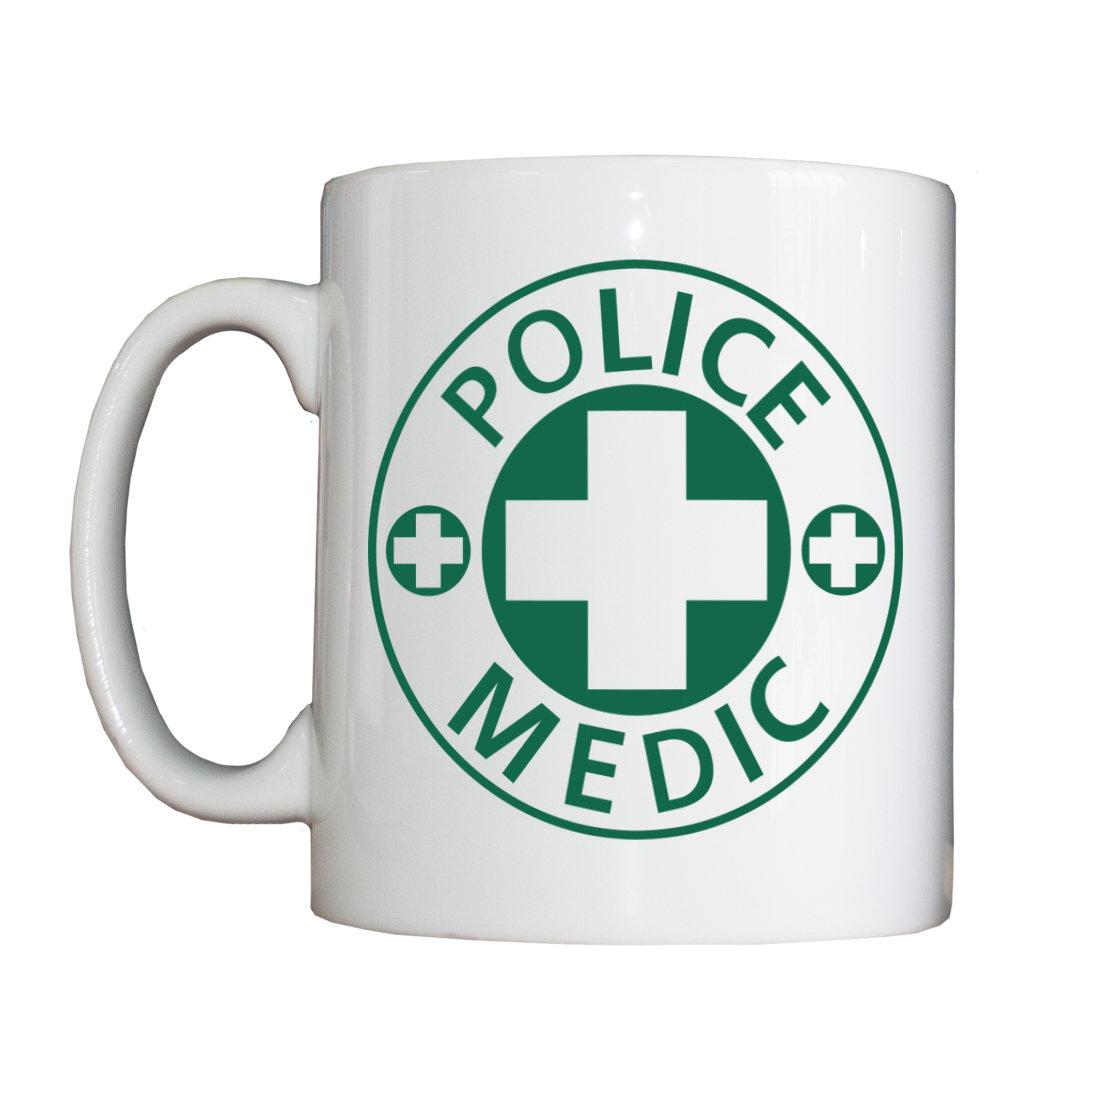 Personalised 'Police Medic' Drinking Vessel PoliceMedicVessel